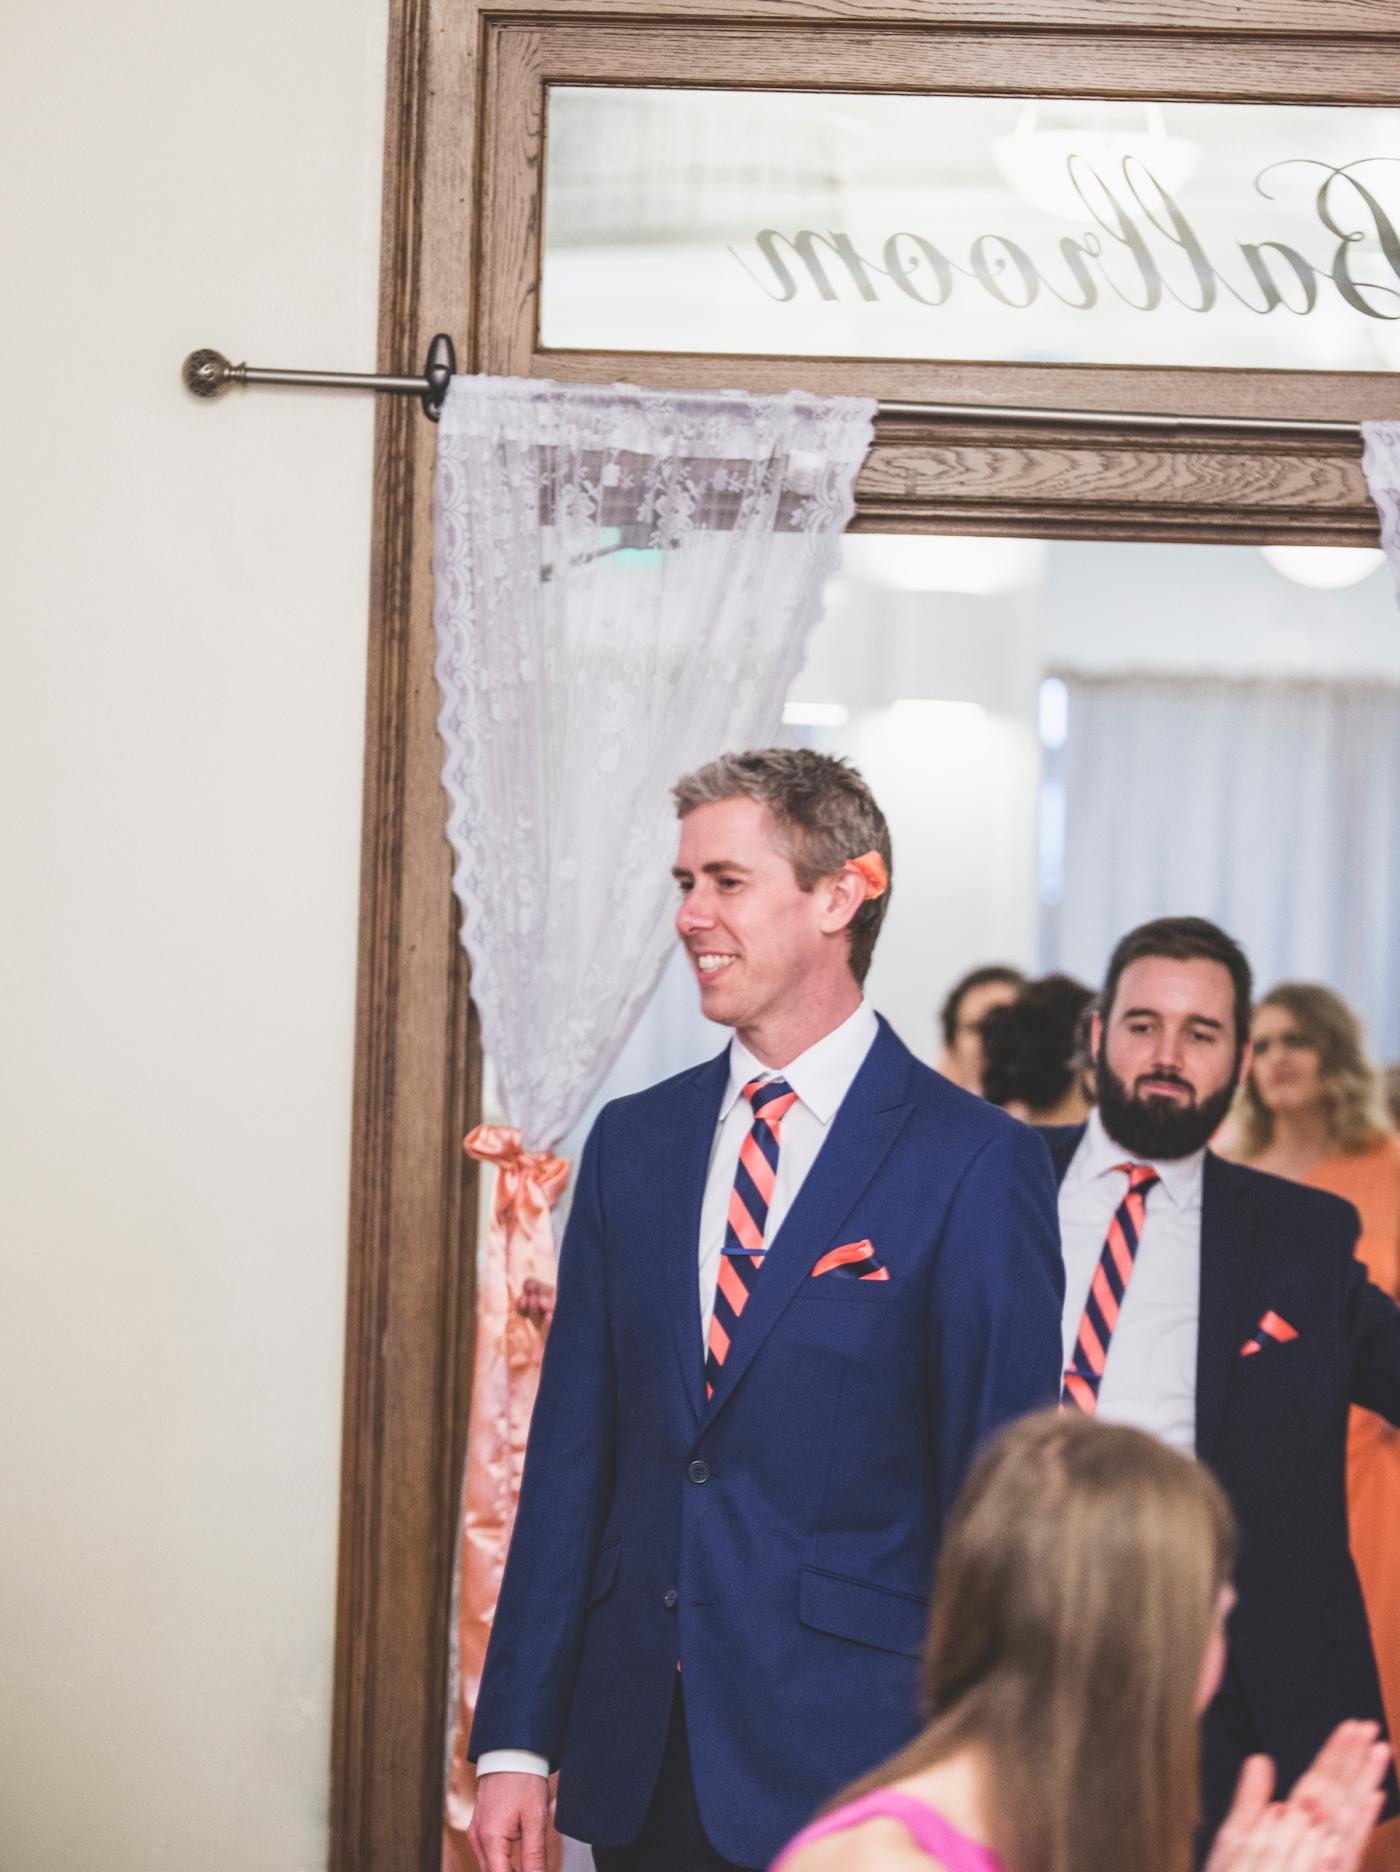 DSC_3127Everett_Wedding_Ballroom_Jane_Speleers_photography_Rachel_and_Edmund_reception_2017